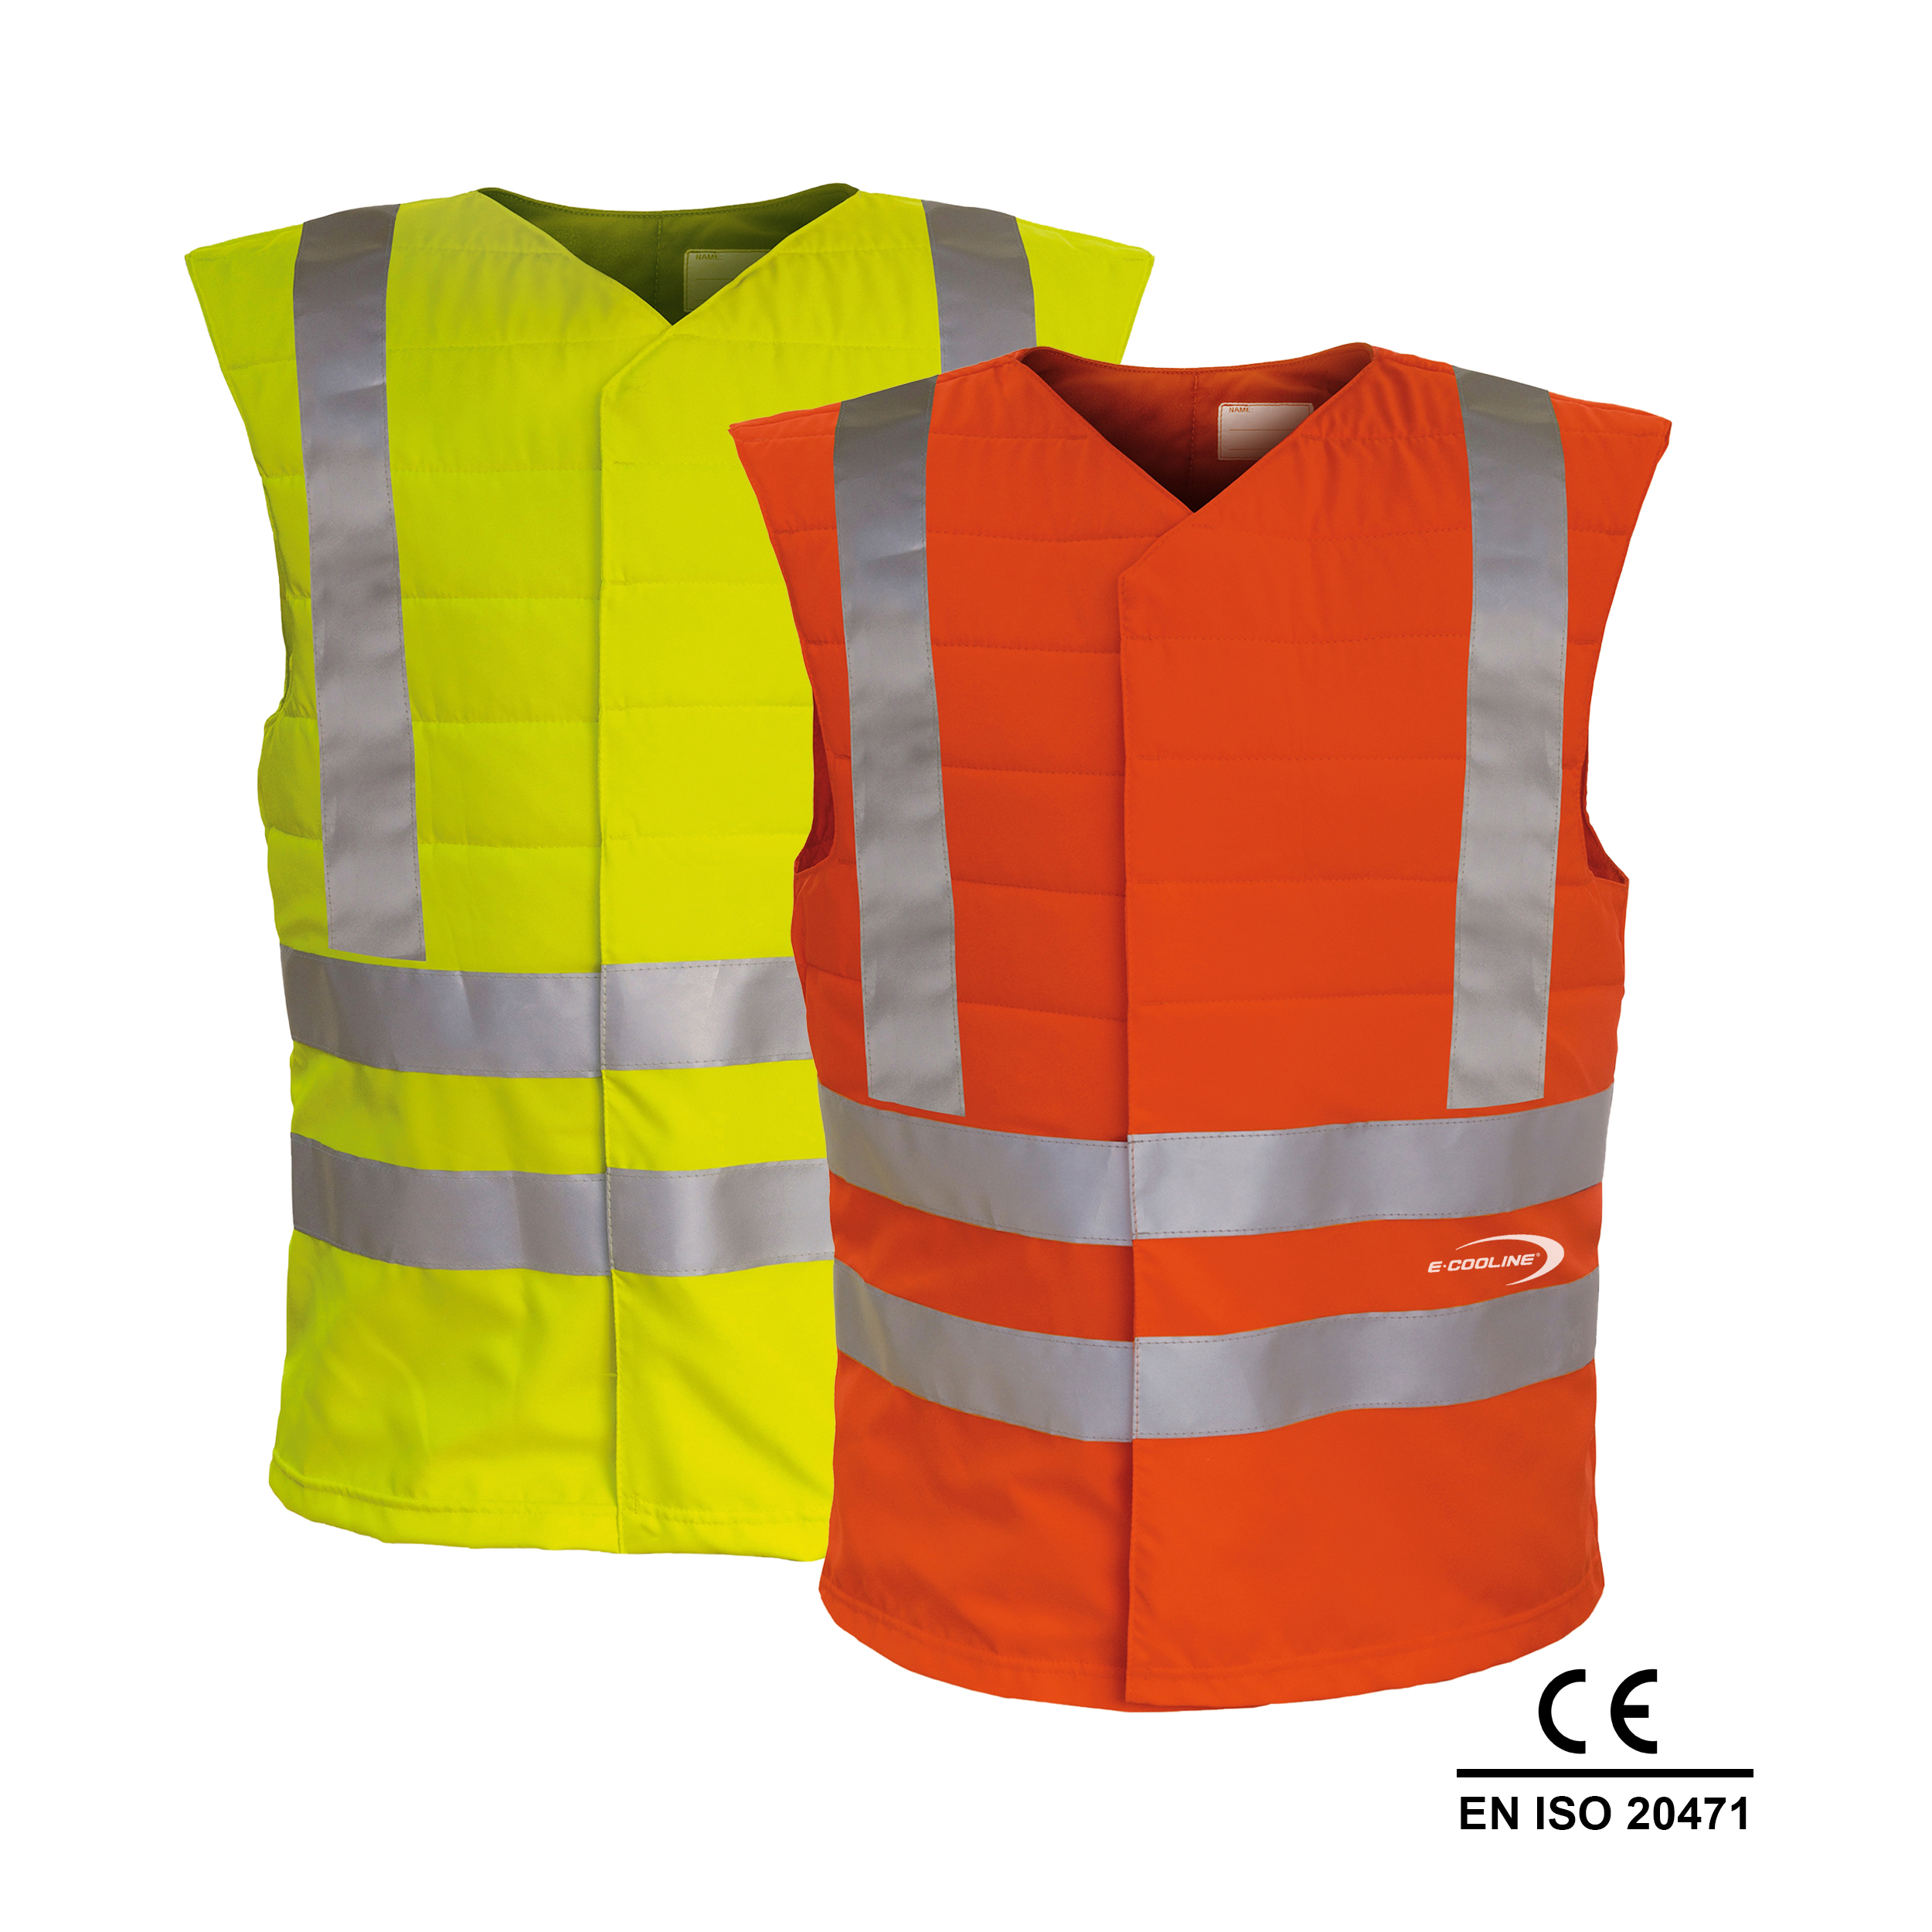 ecooline powersignal cooling vest-SX3